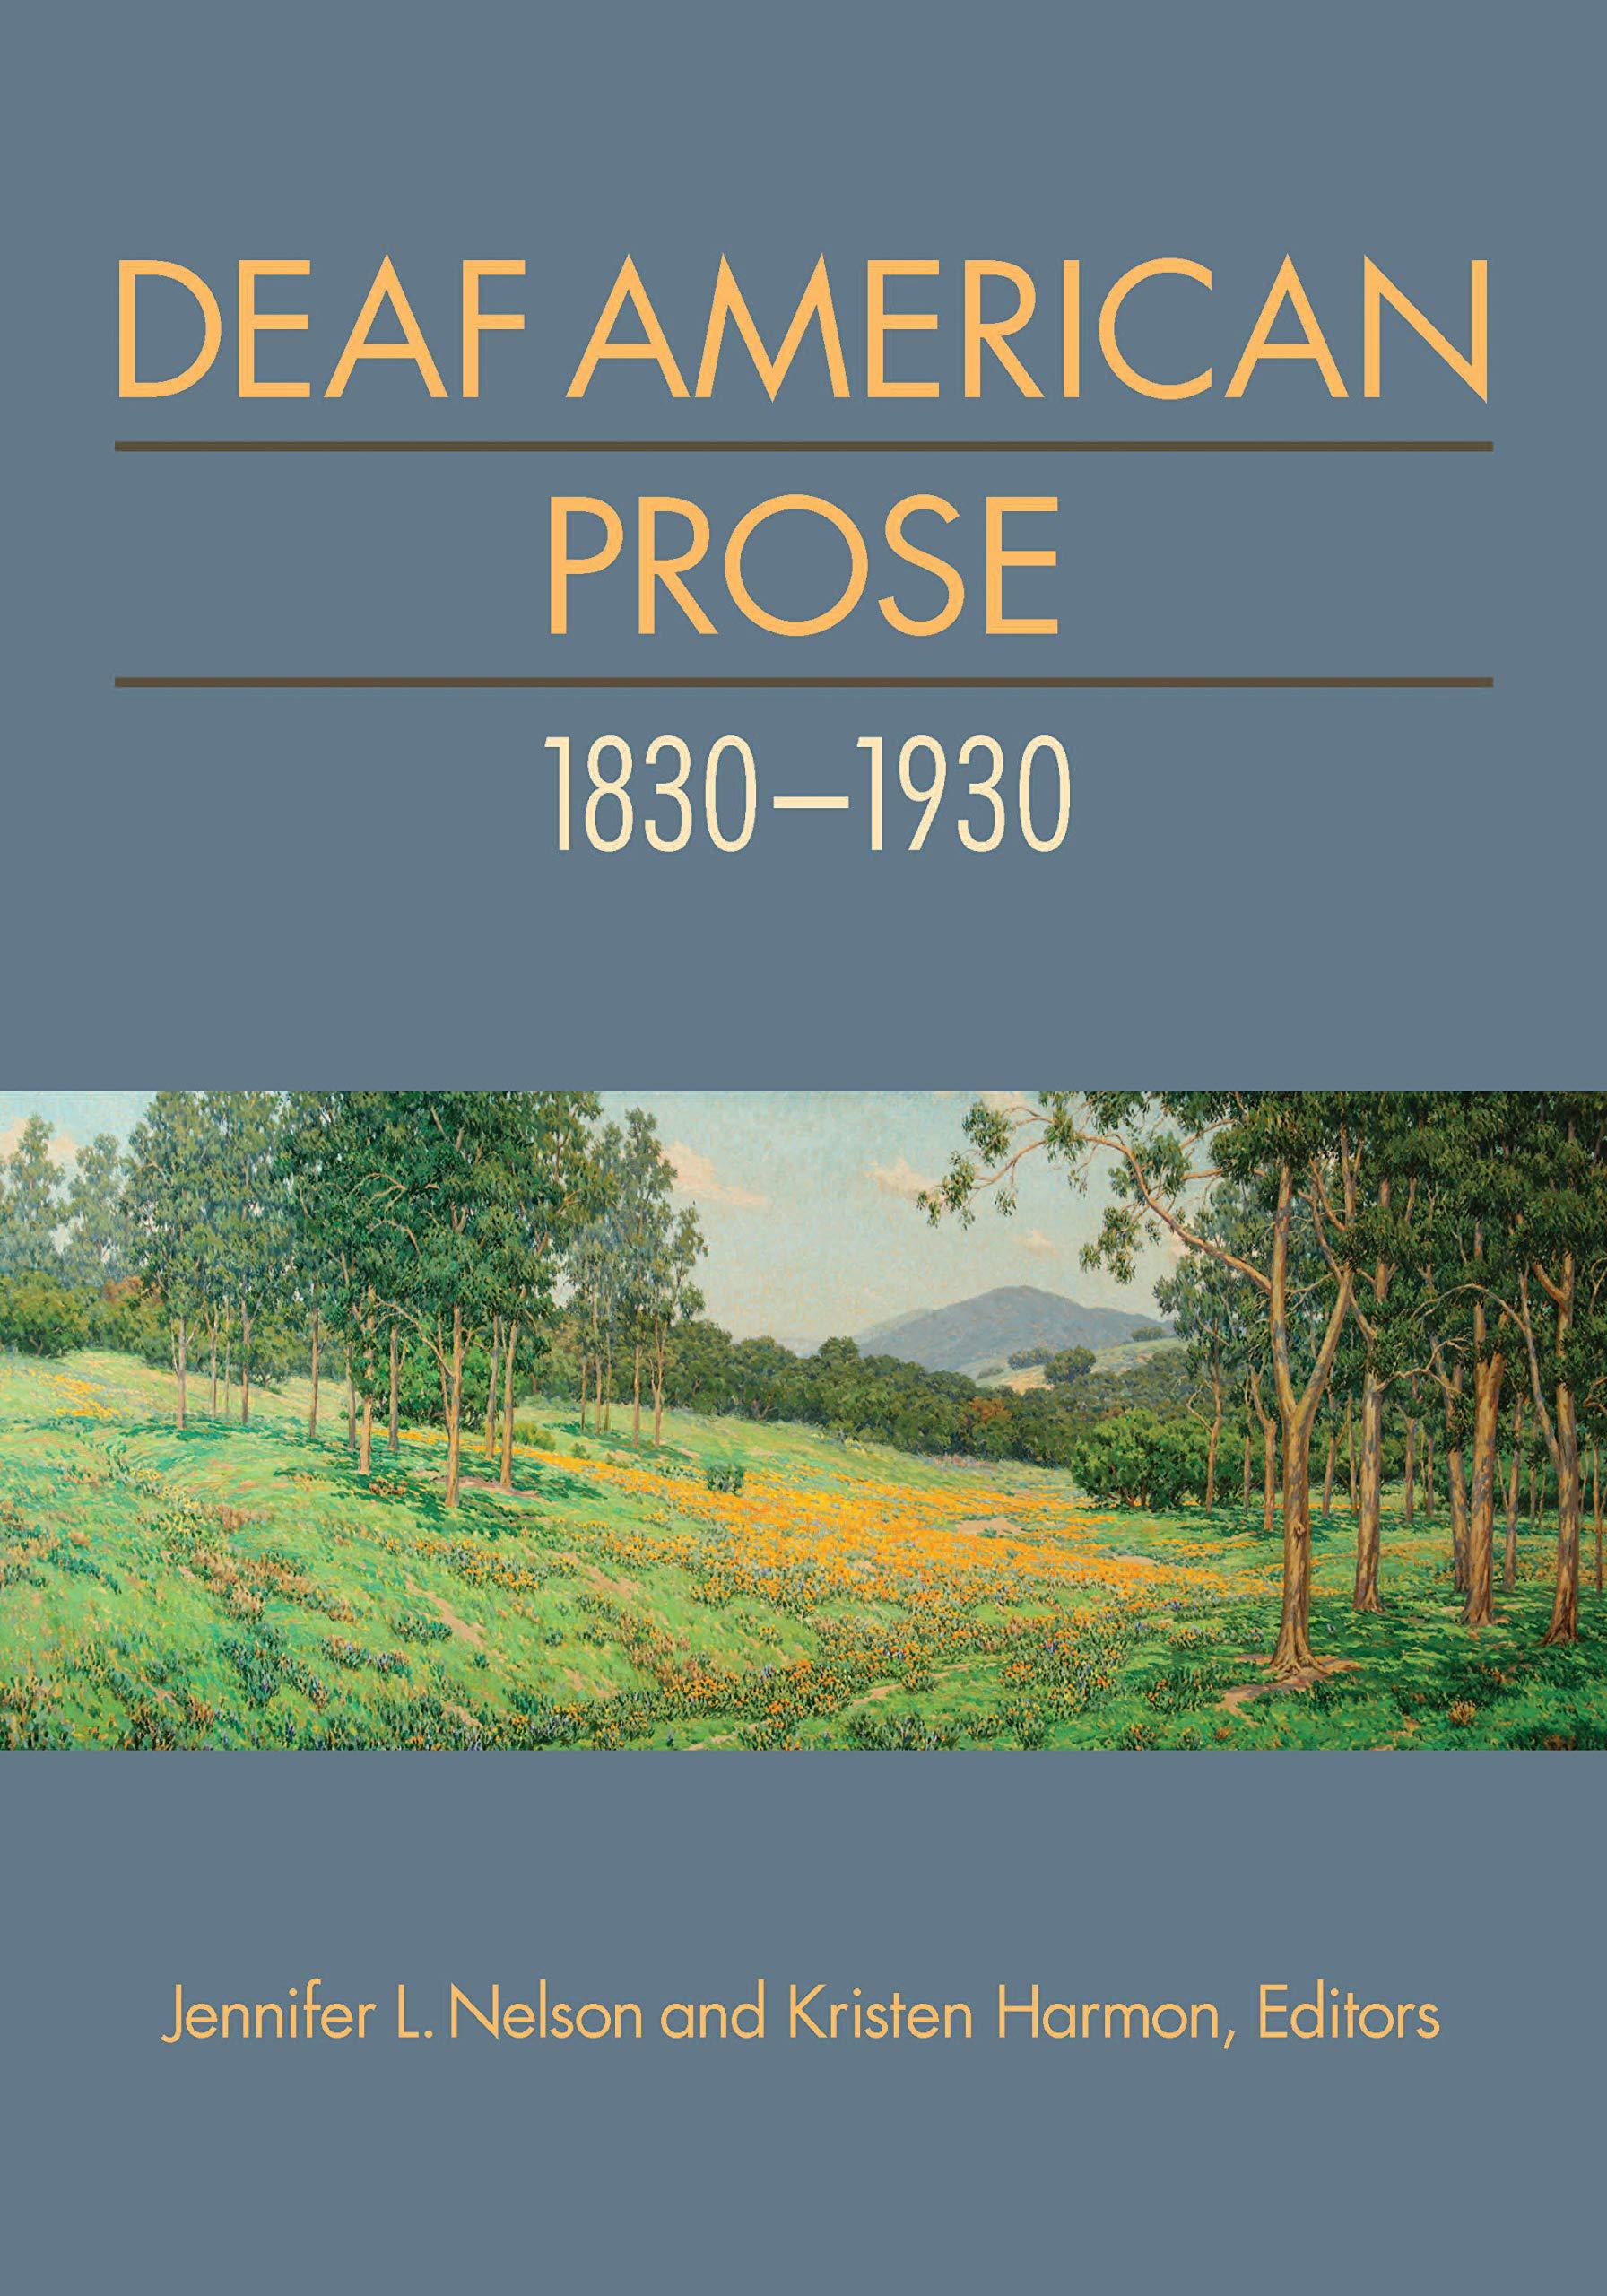 Download Deaf American Prose, 1830-1930 (Gallaudet Deaf Literature Series) pdf epub